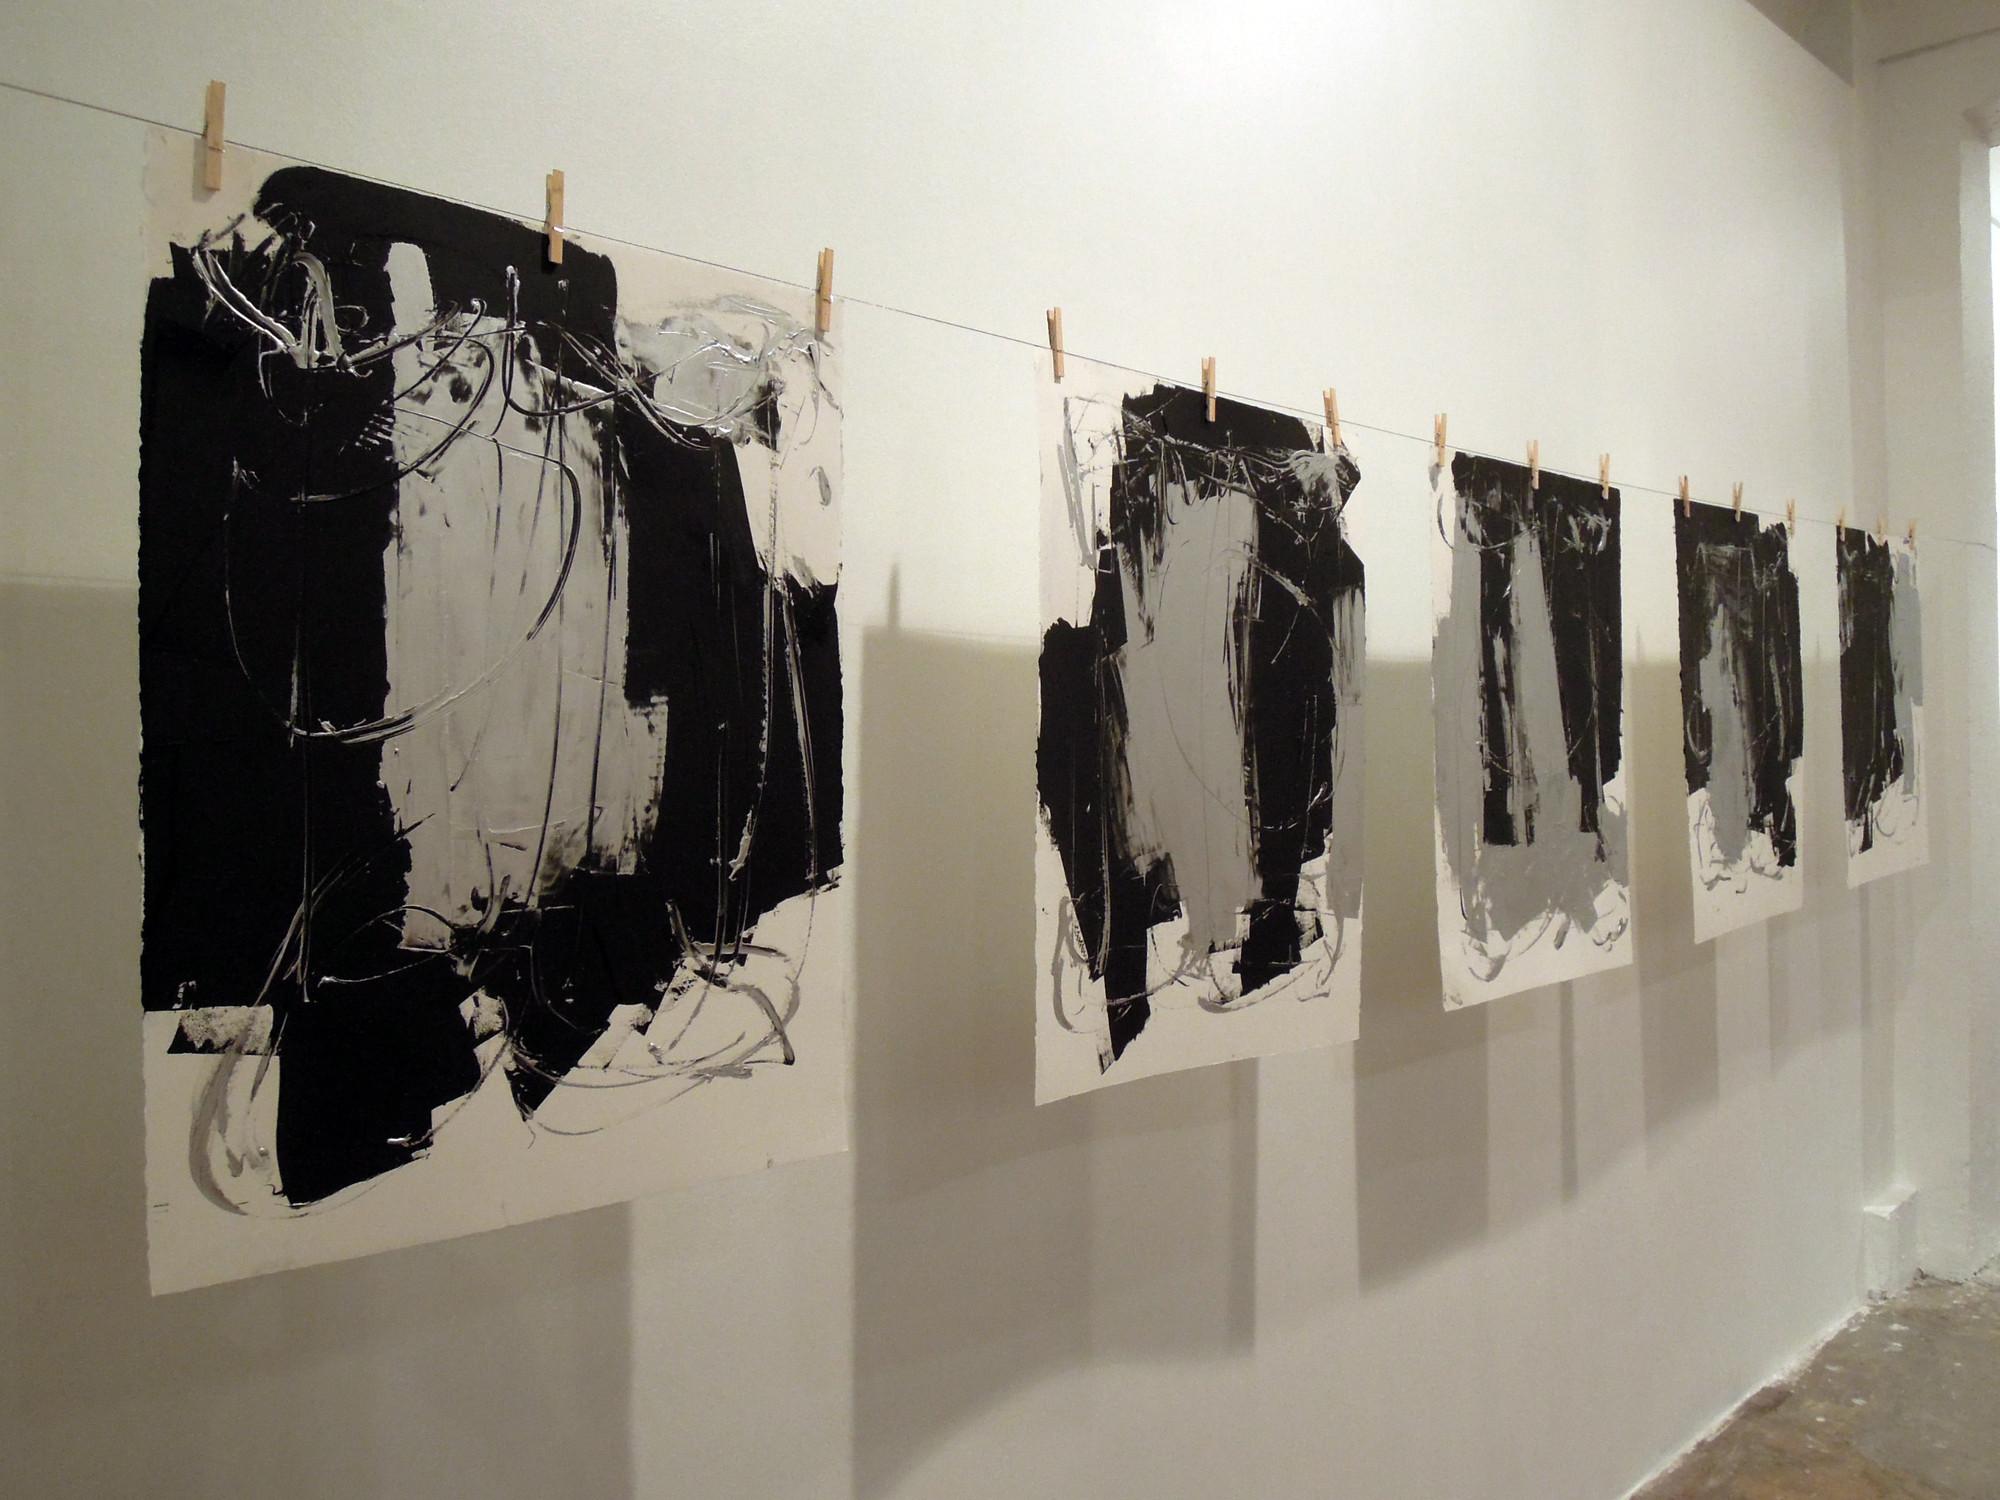 Smiljan Radic - Serie Columnas. Image Courtesy of Javiera González Zarzar